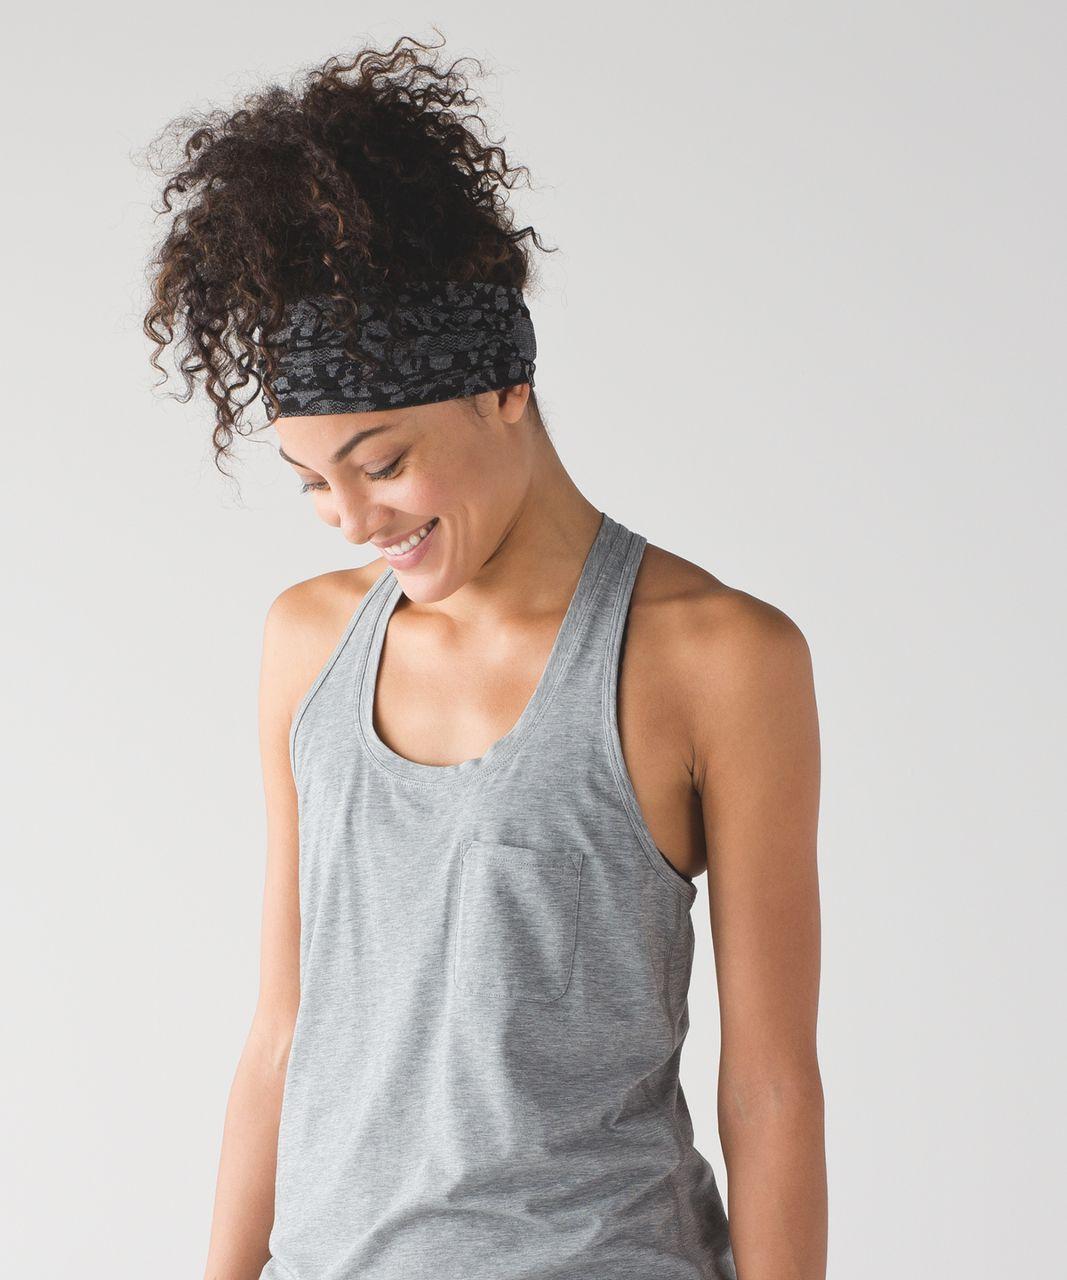 Lululemon Bangs Back Headwrap - Heathered Black / Black